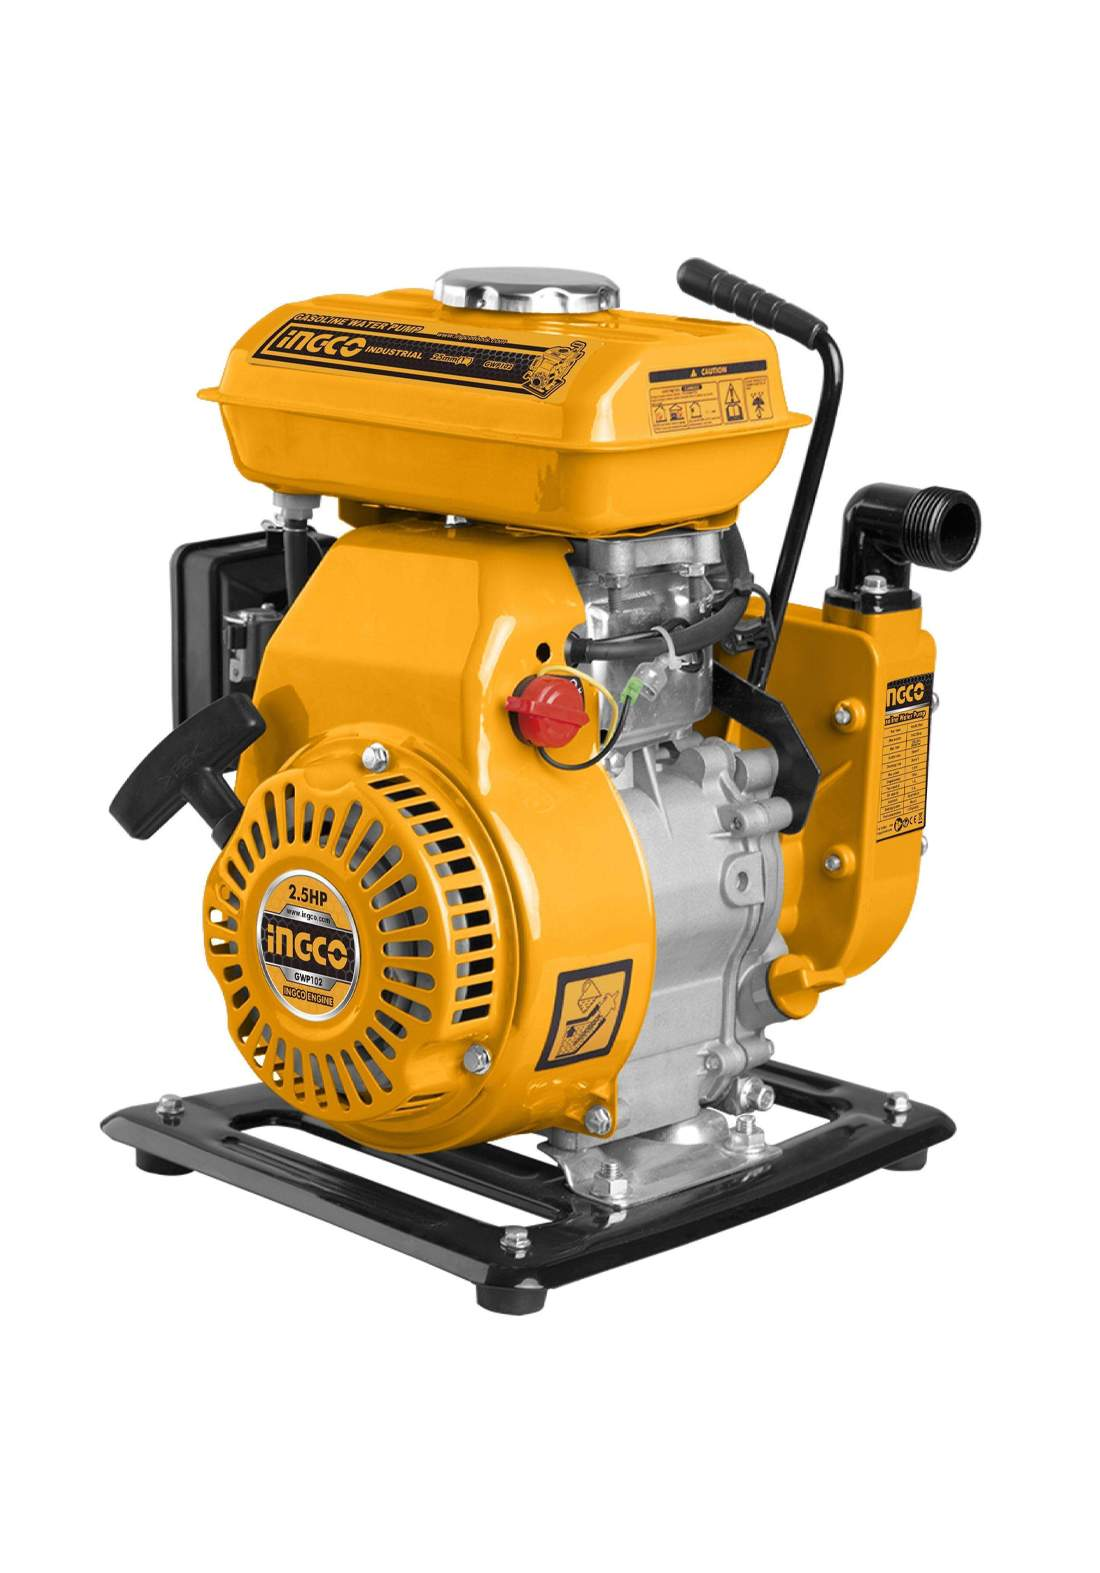 Ingco GWP102 Gasoline Water Pump 2.5HP 100L/min ماطور ماء